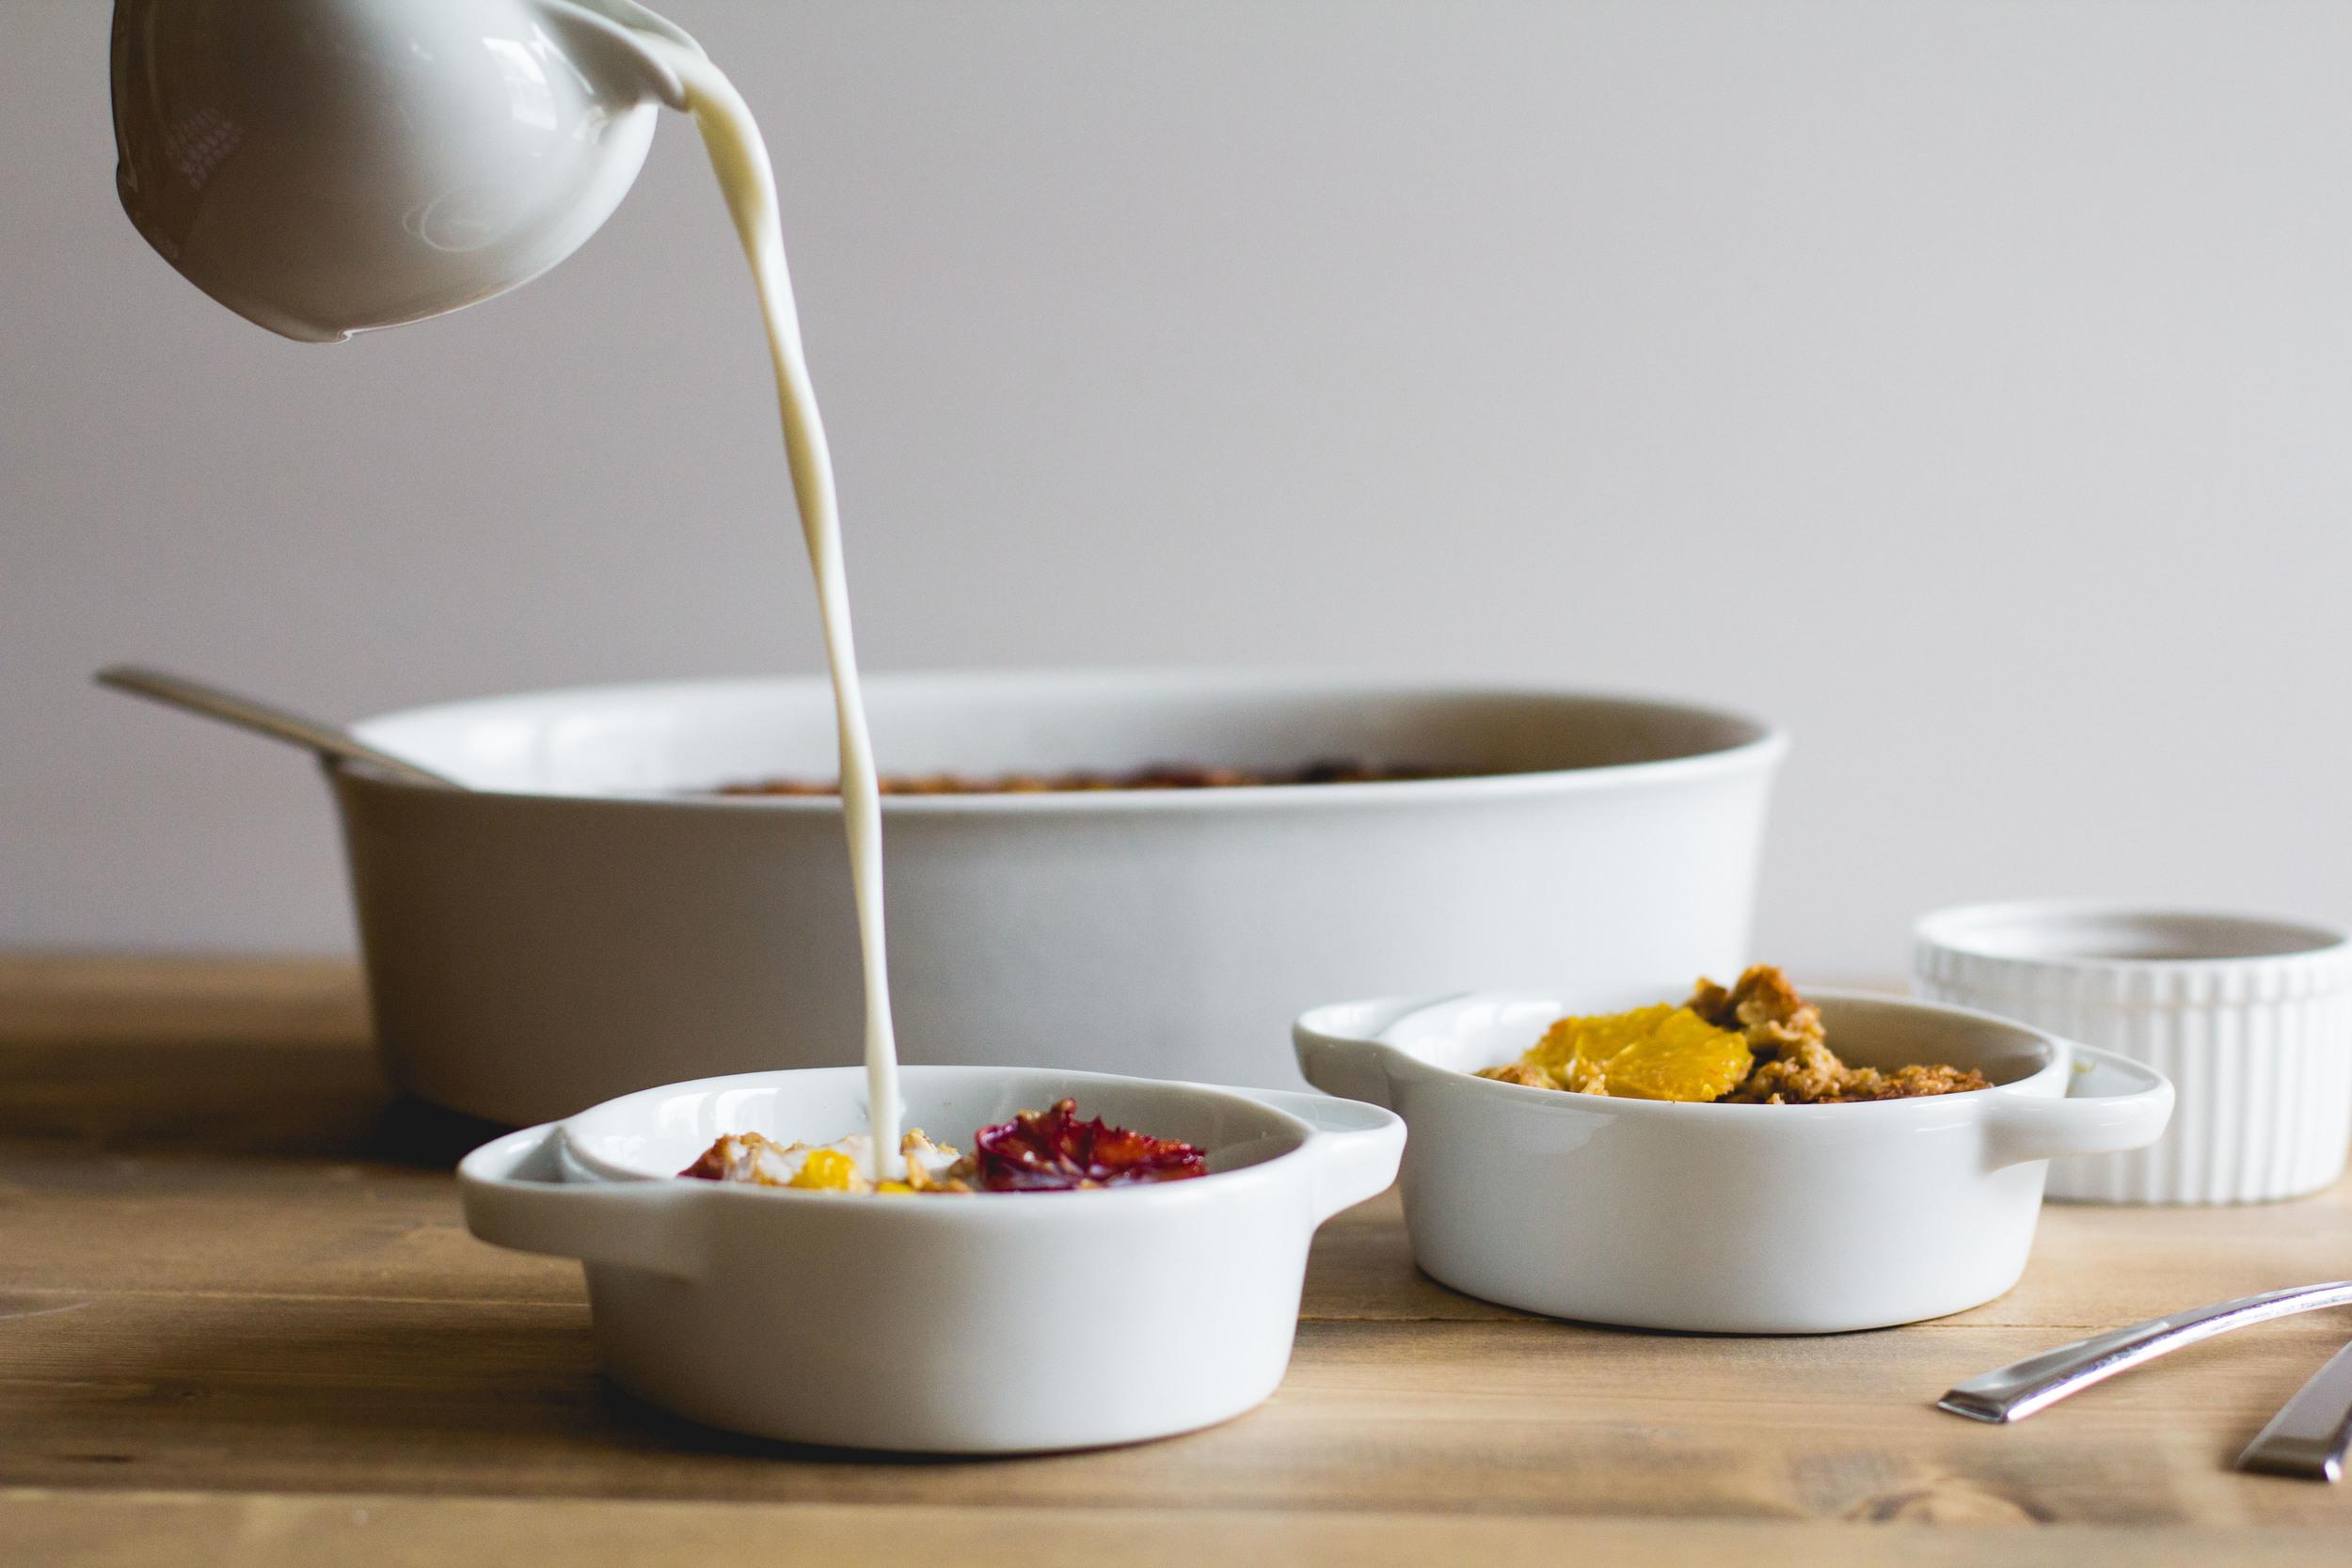 Dairy-Free Citrus Baked Oatmeal | Sarah J. Hauser